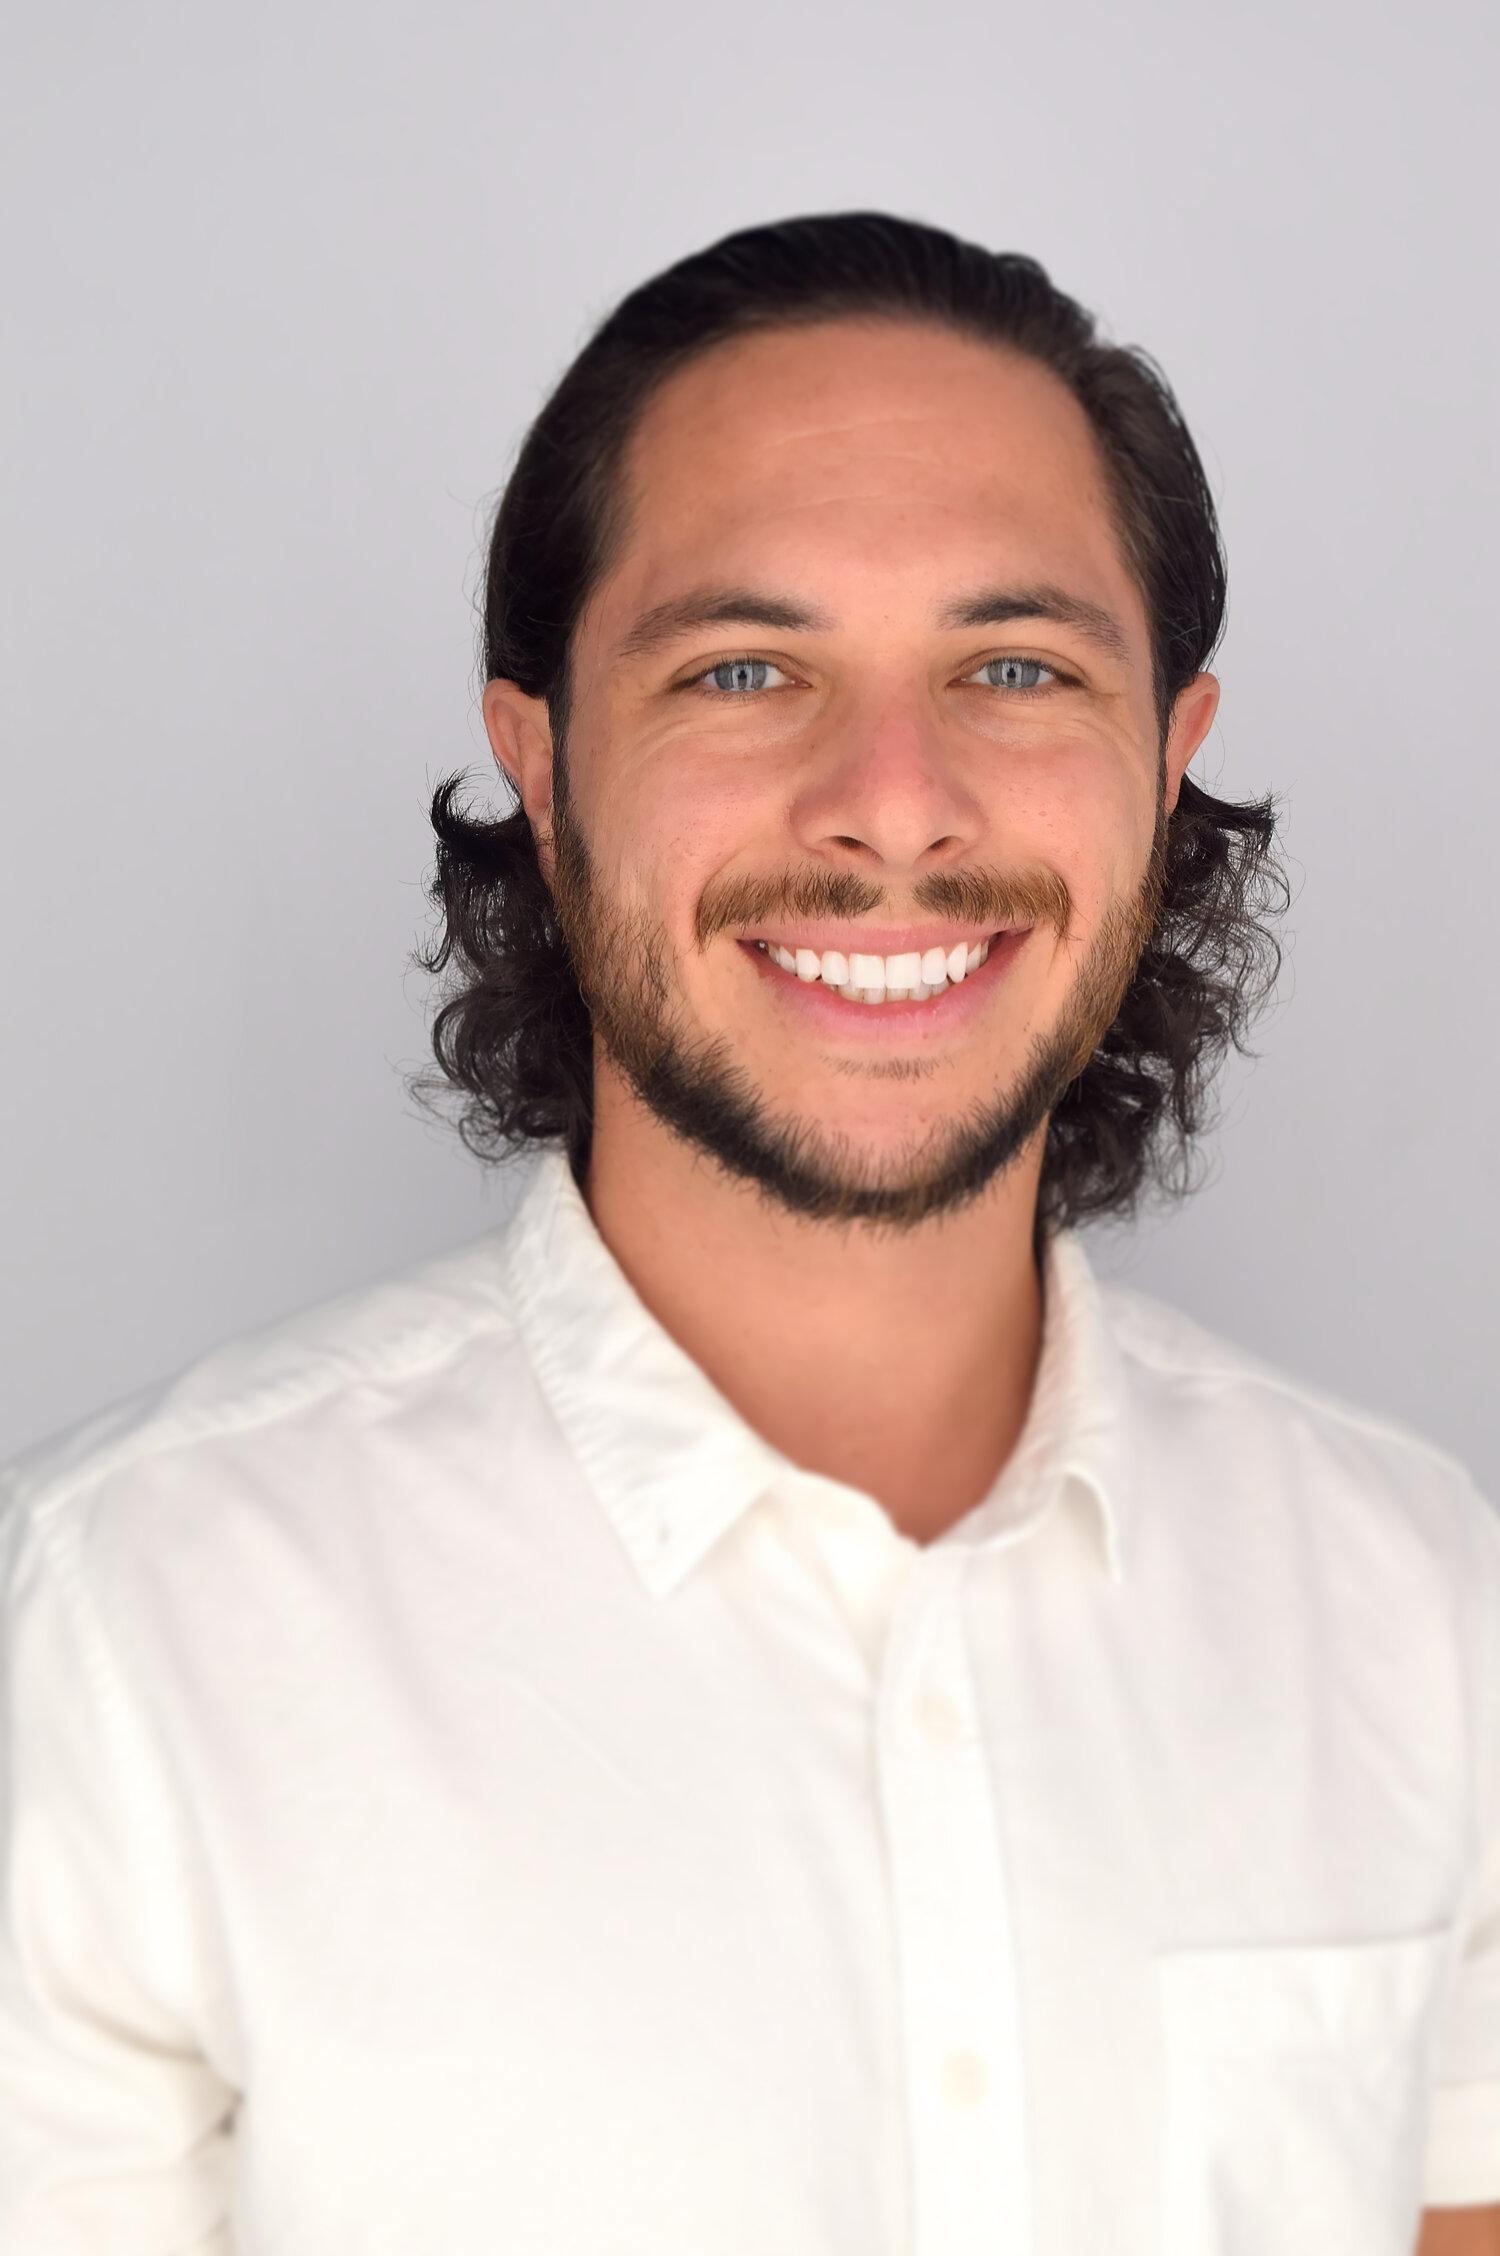 Dr. Ryan Albert, Chiropractor